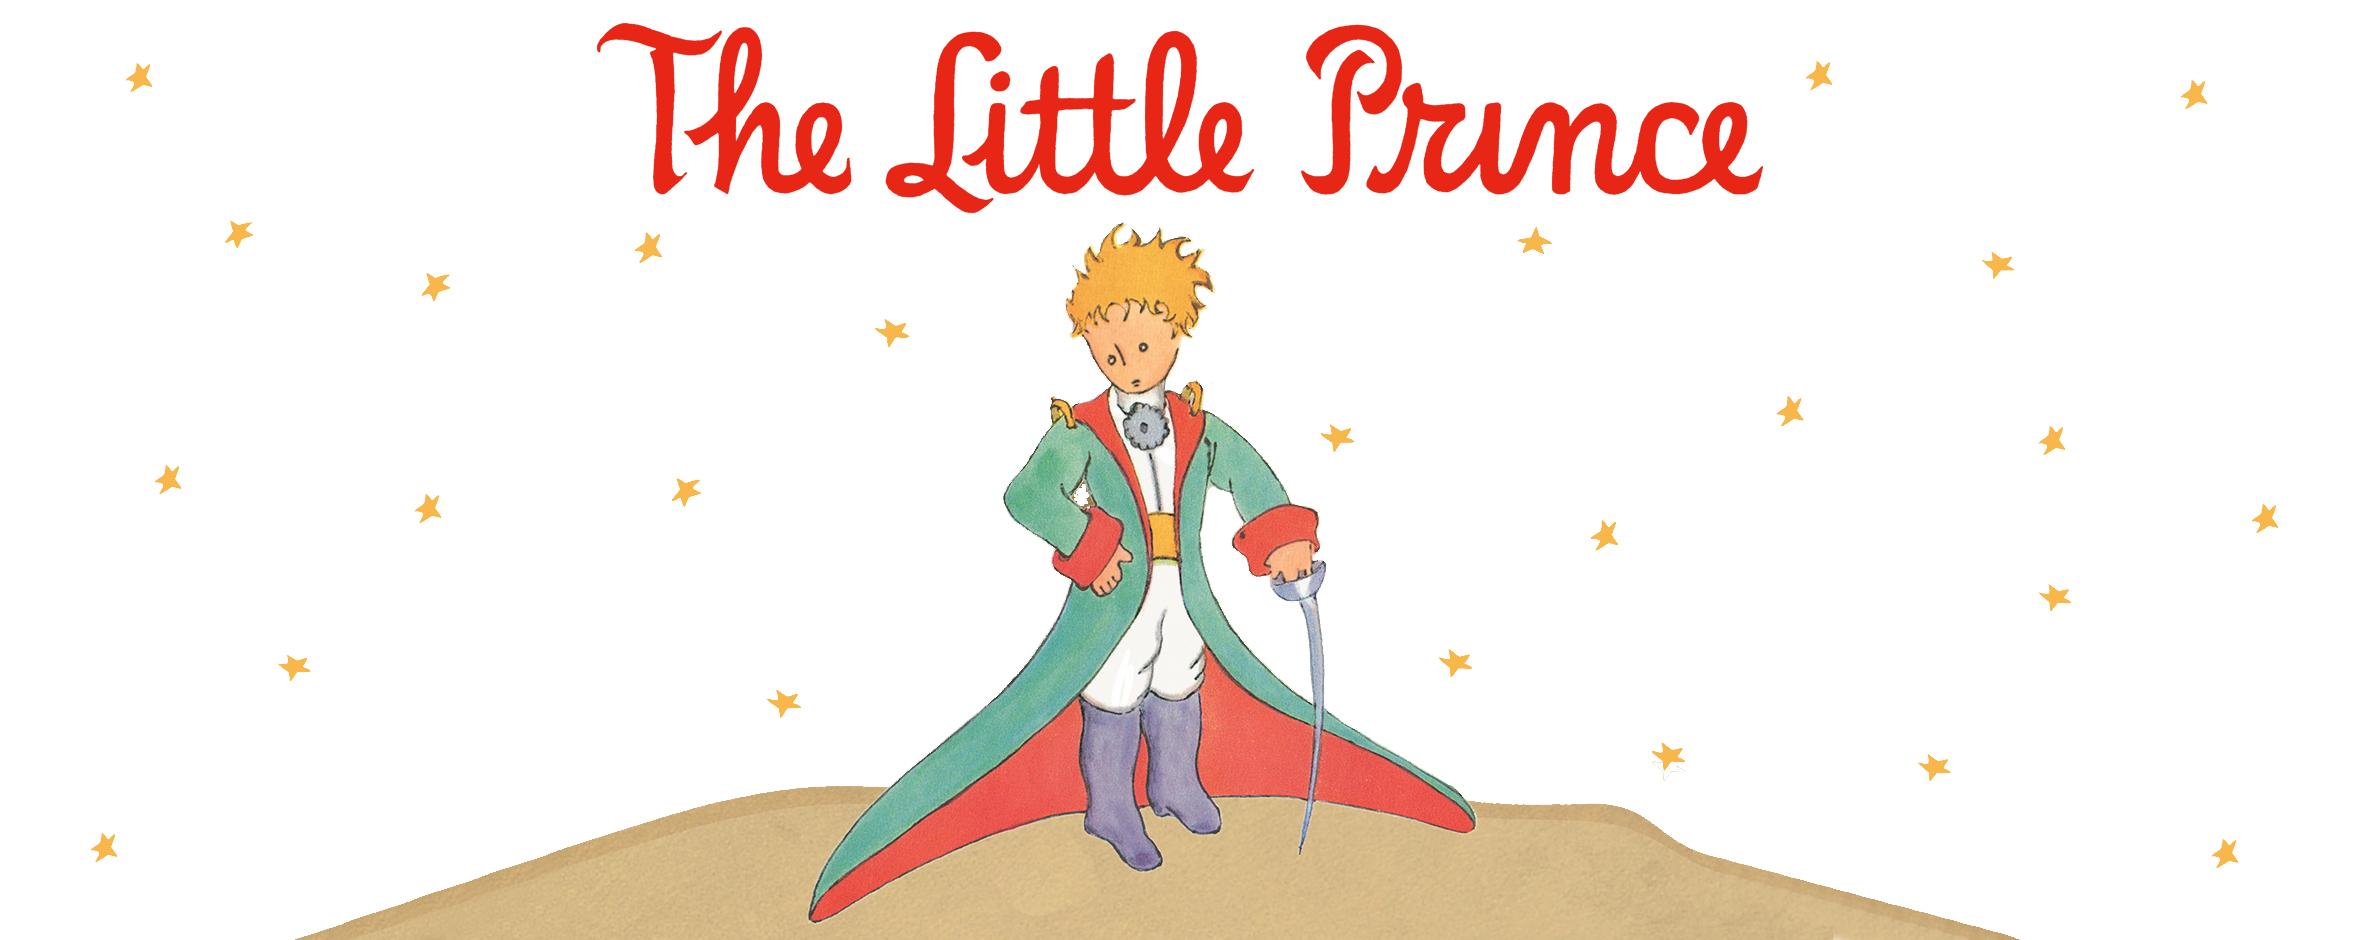 8 Timeless Books Like The Little Prince